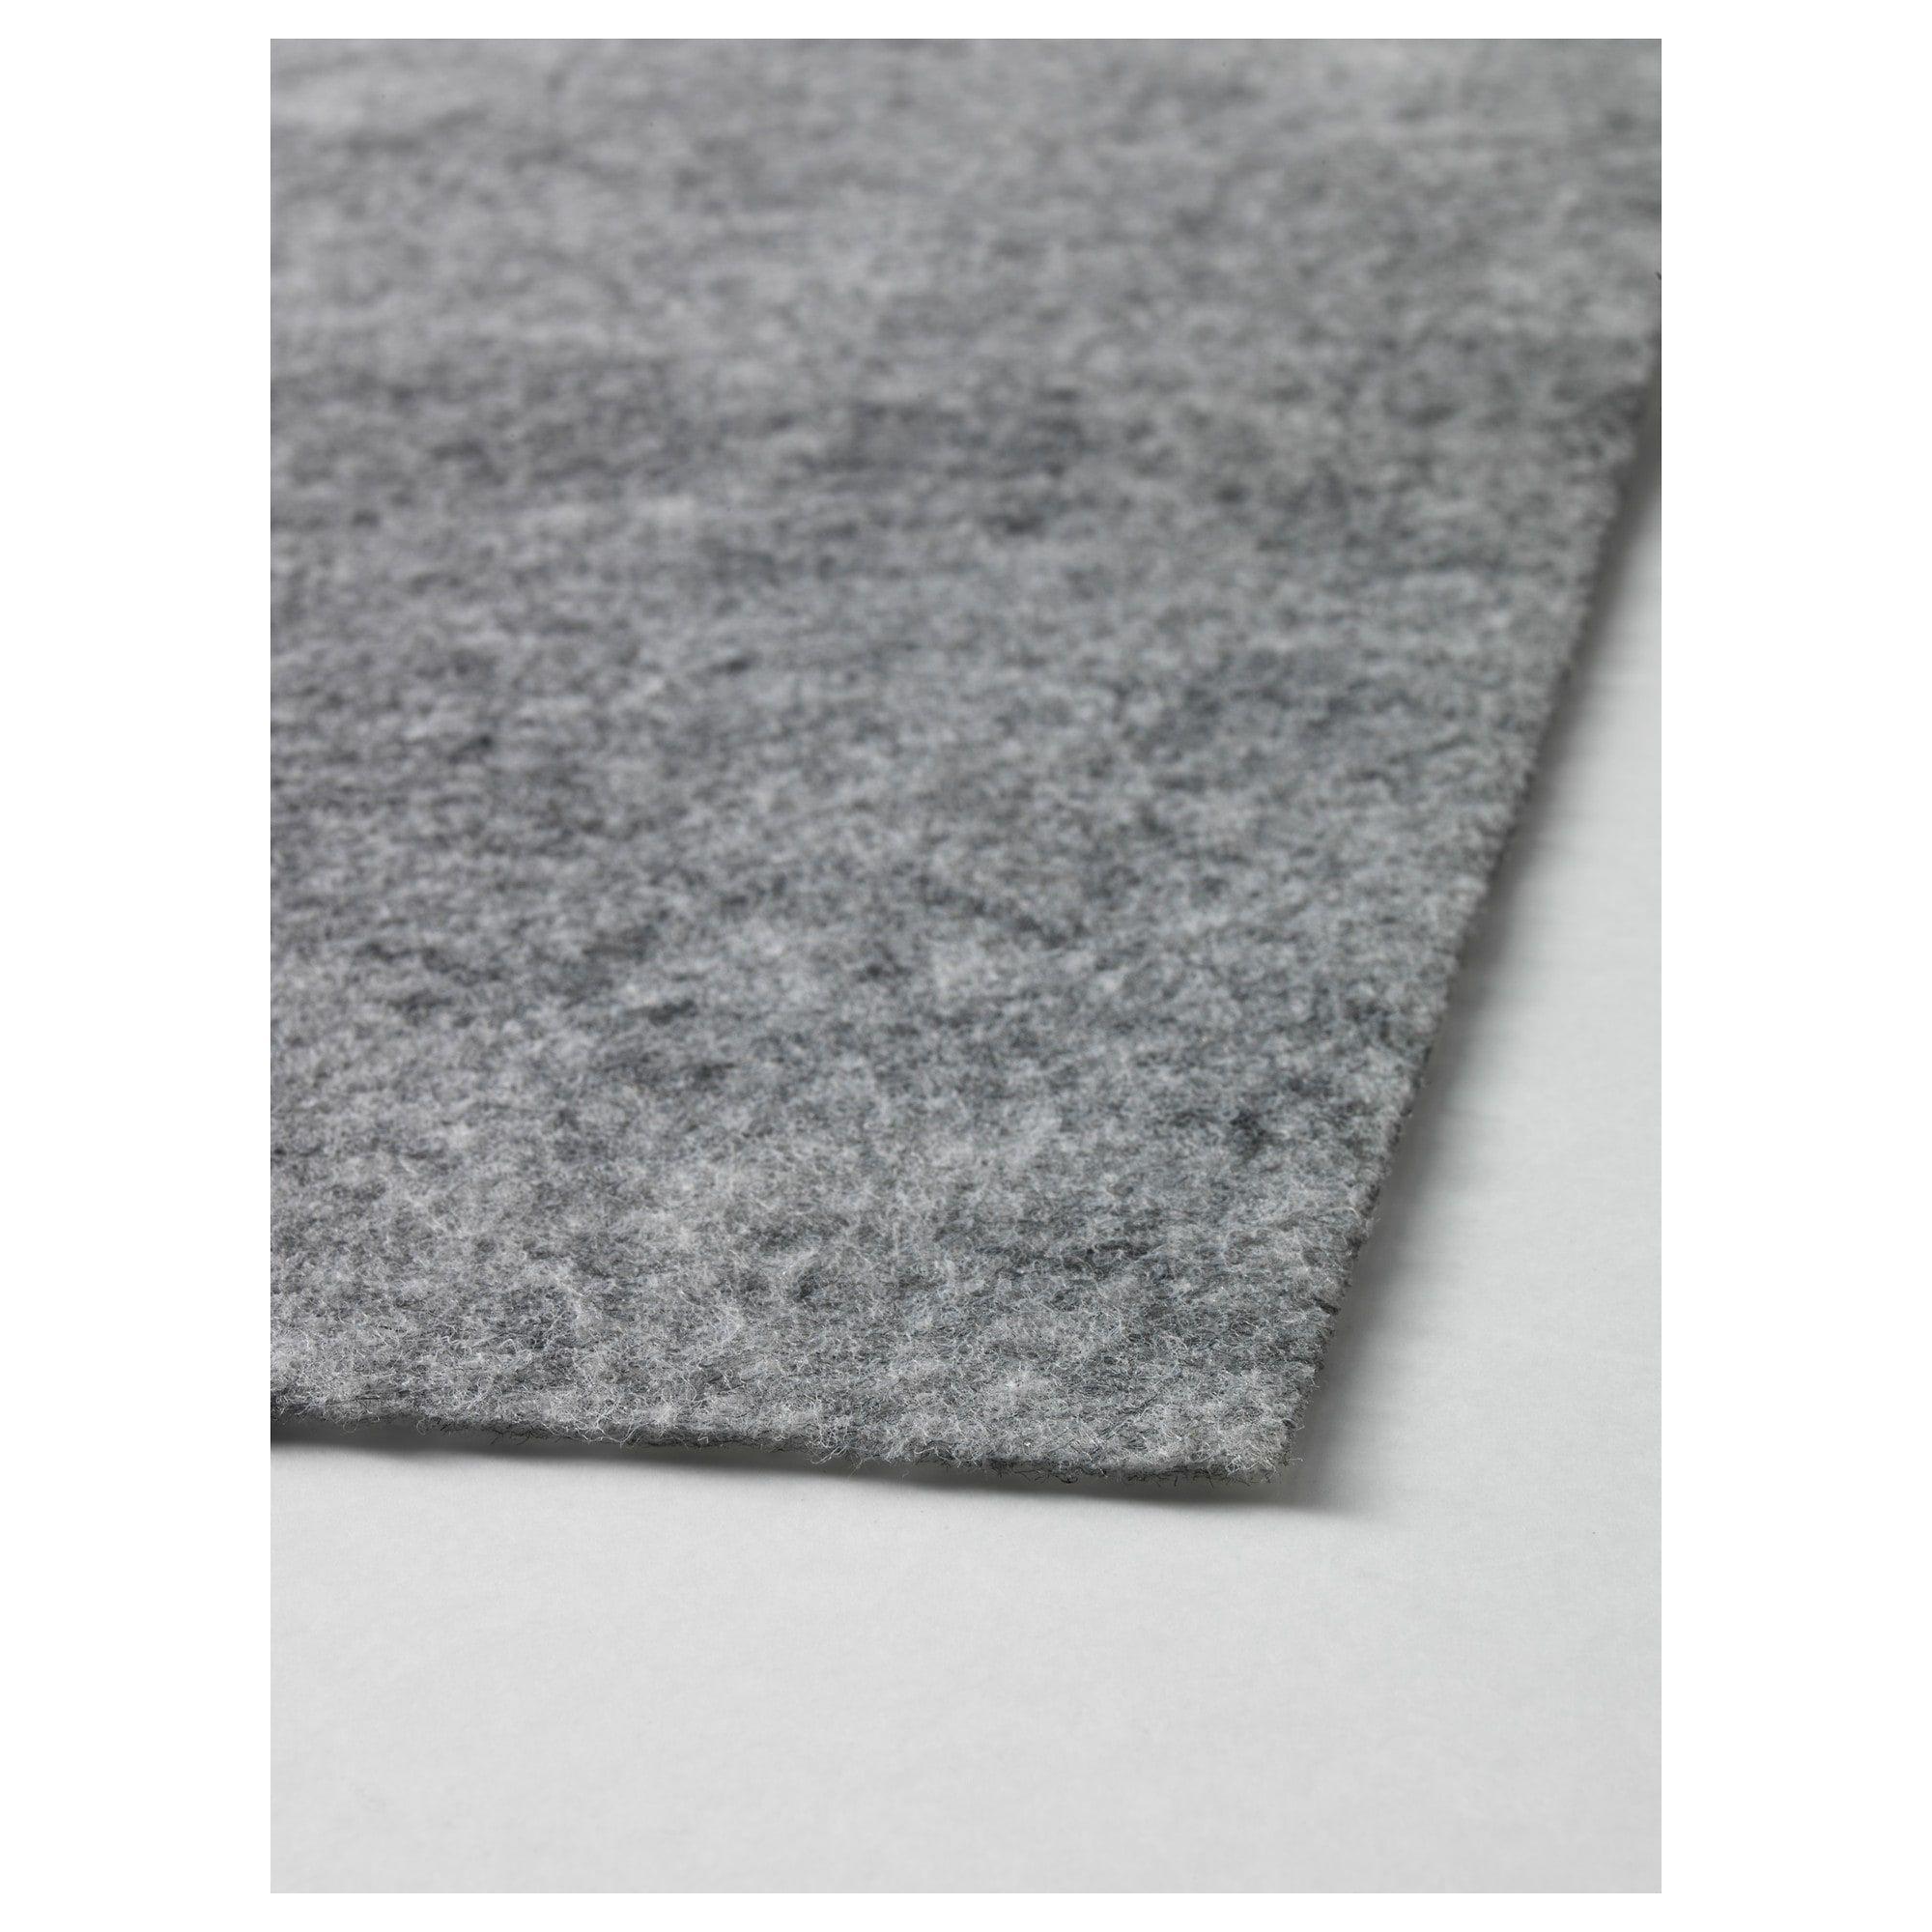 Baring Rug Underlay With Anti Slip Ikea Rugs Ikea Diy Carpet